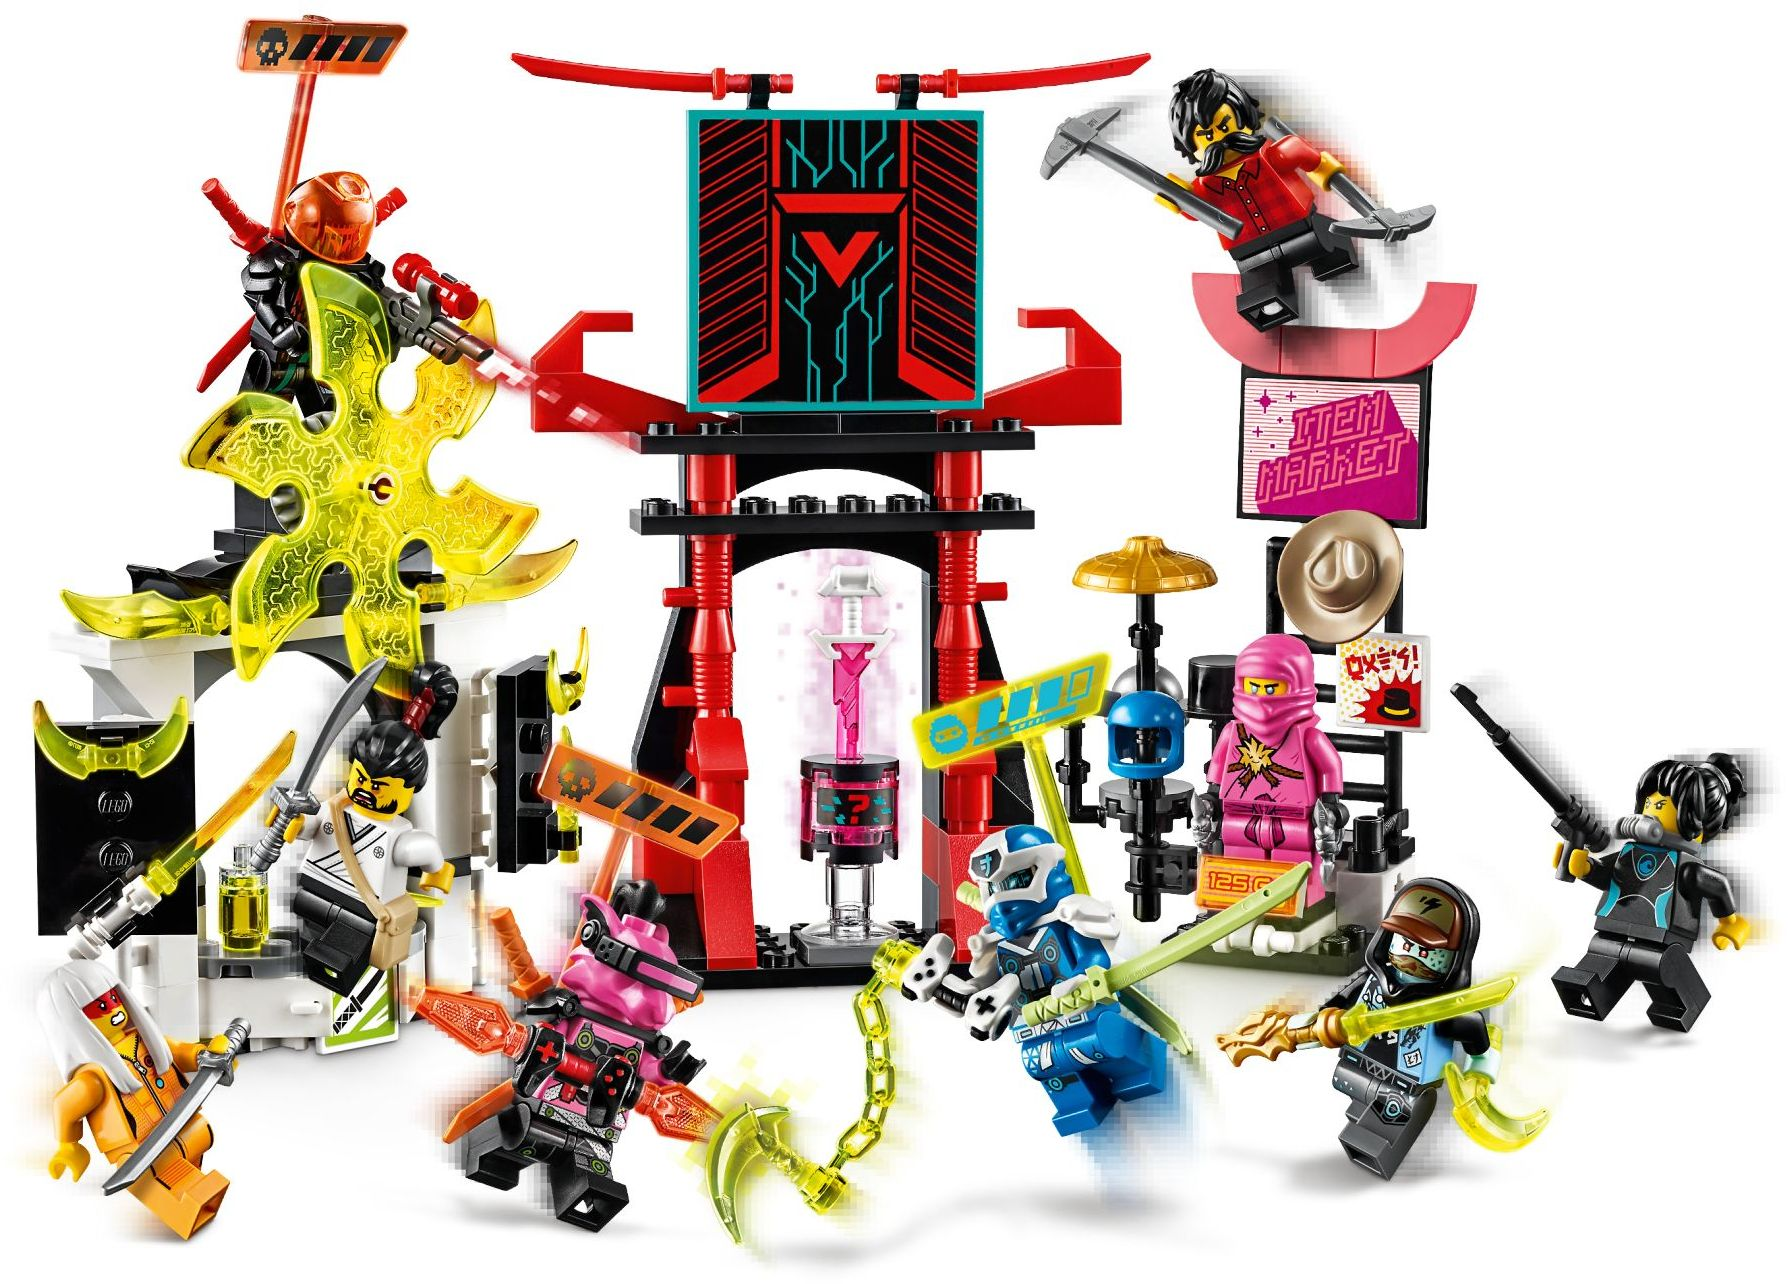 71708 LEGO Ninjago PRIME EMPIRE Gamer's Market - Hội chợ game thủ